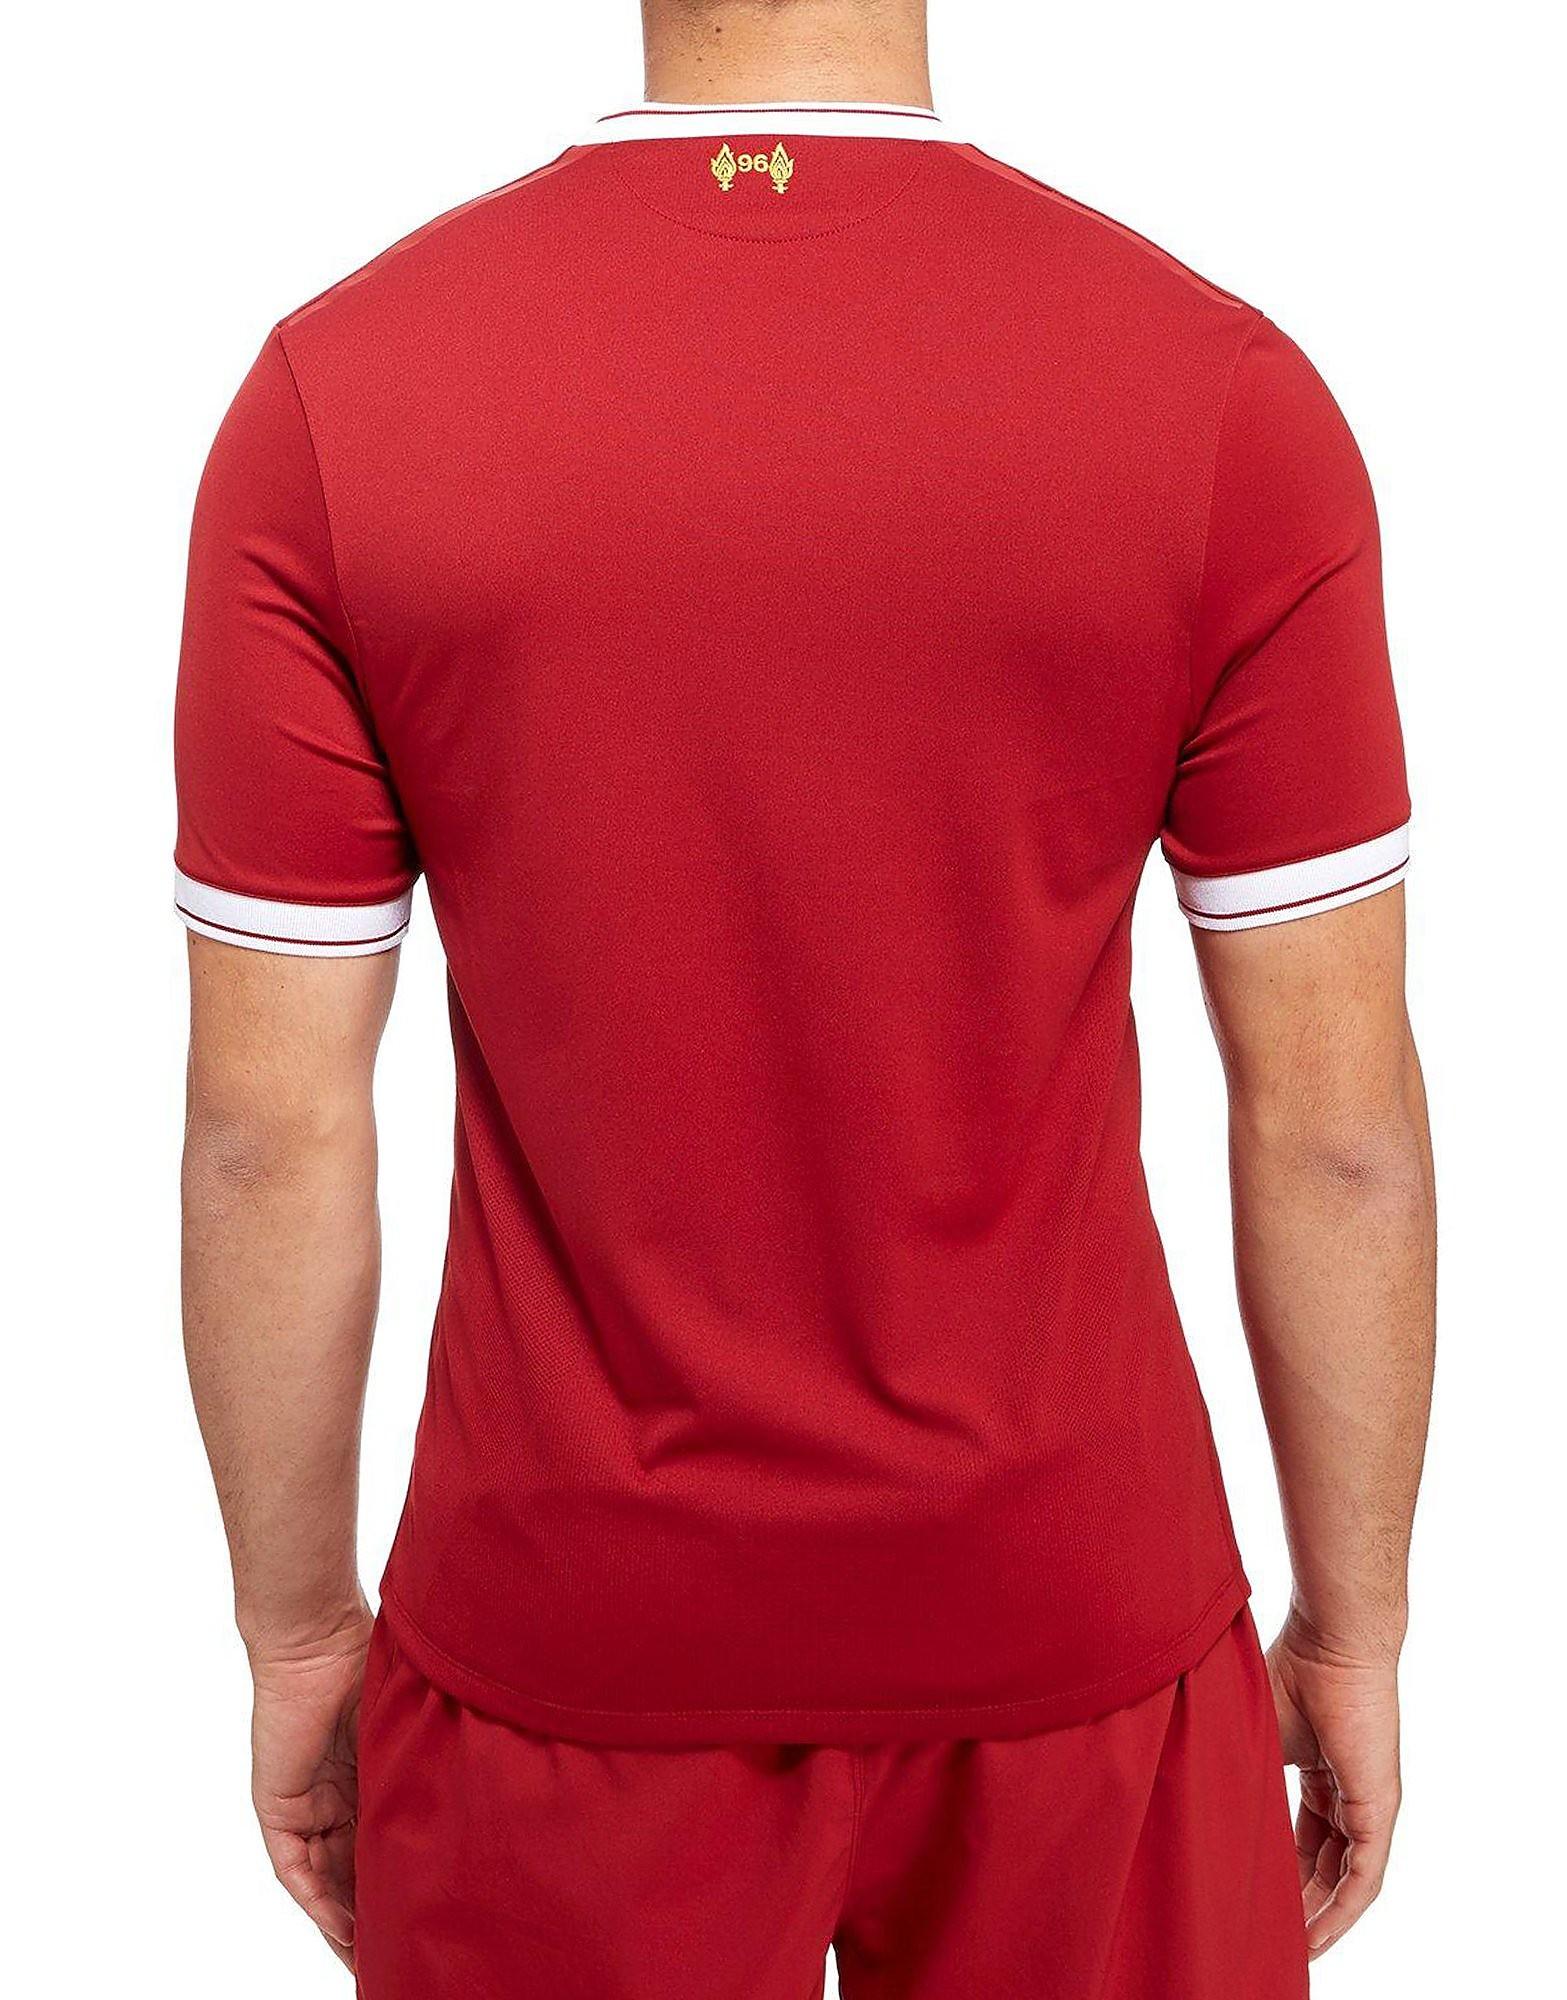 New Balance Liverpool FC 2017/18 Elite Home Shirt